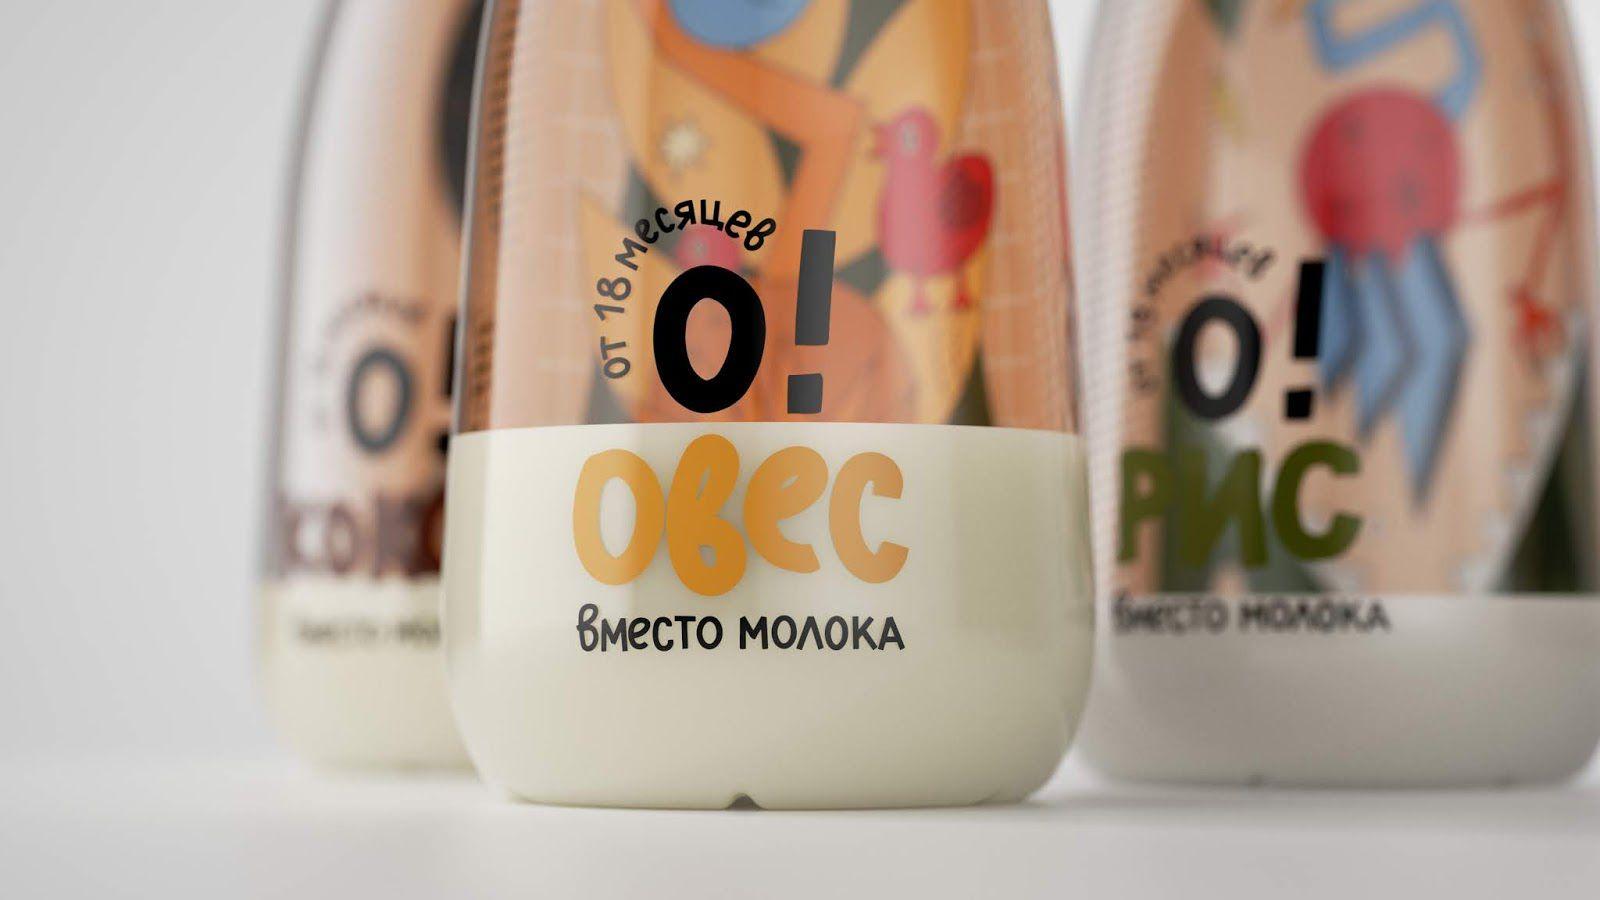 """O!"" (""laits"" végétaux pour enfants) I Design (projet étudiant) : Bogdana Basorgina (British Higher School of Art and Design), Russie (janvier 2020)"